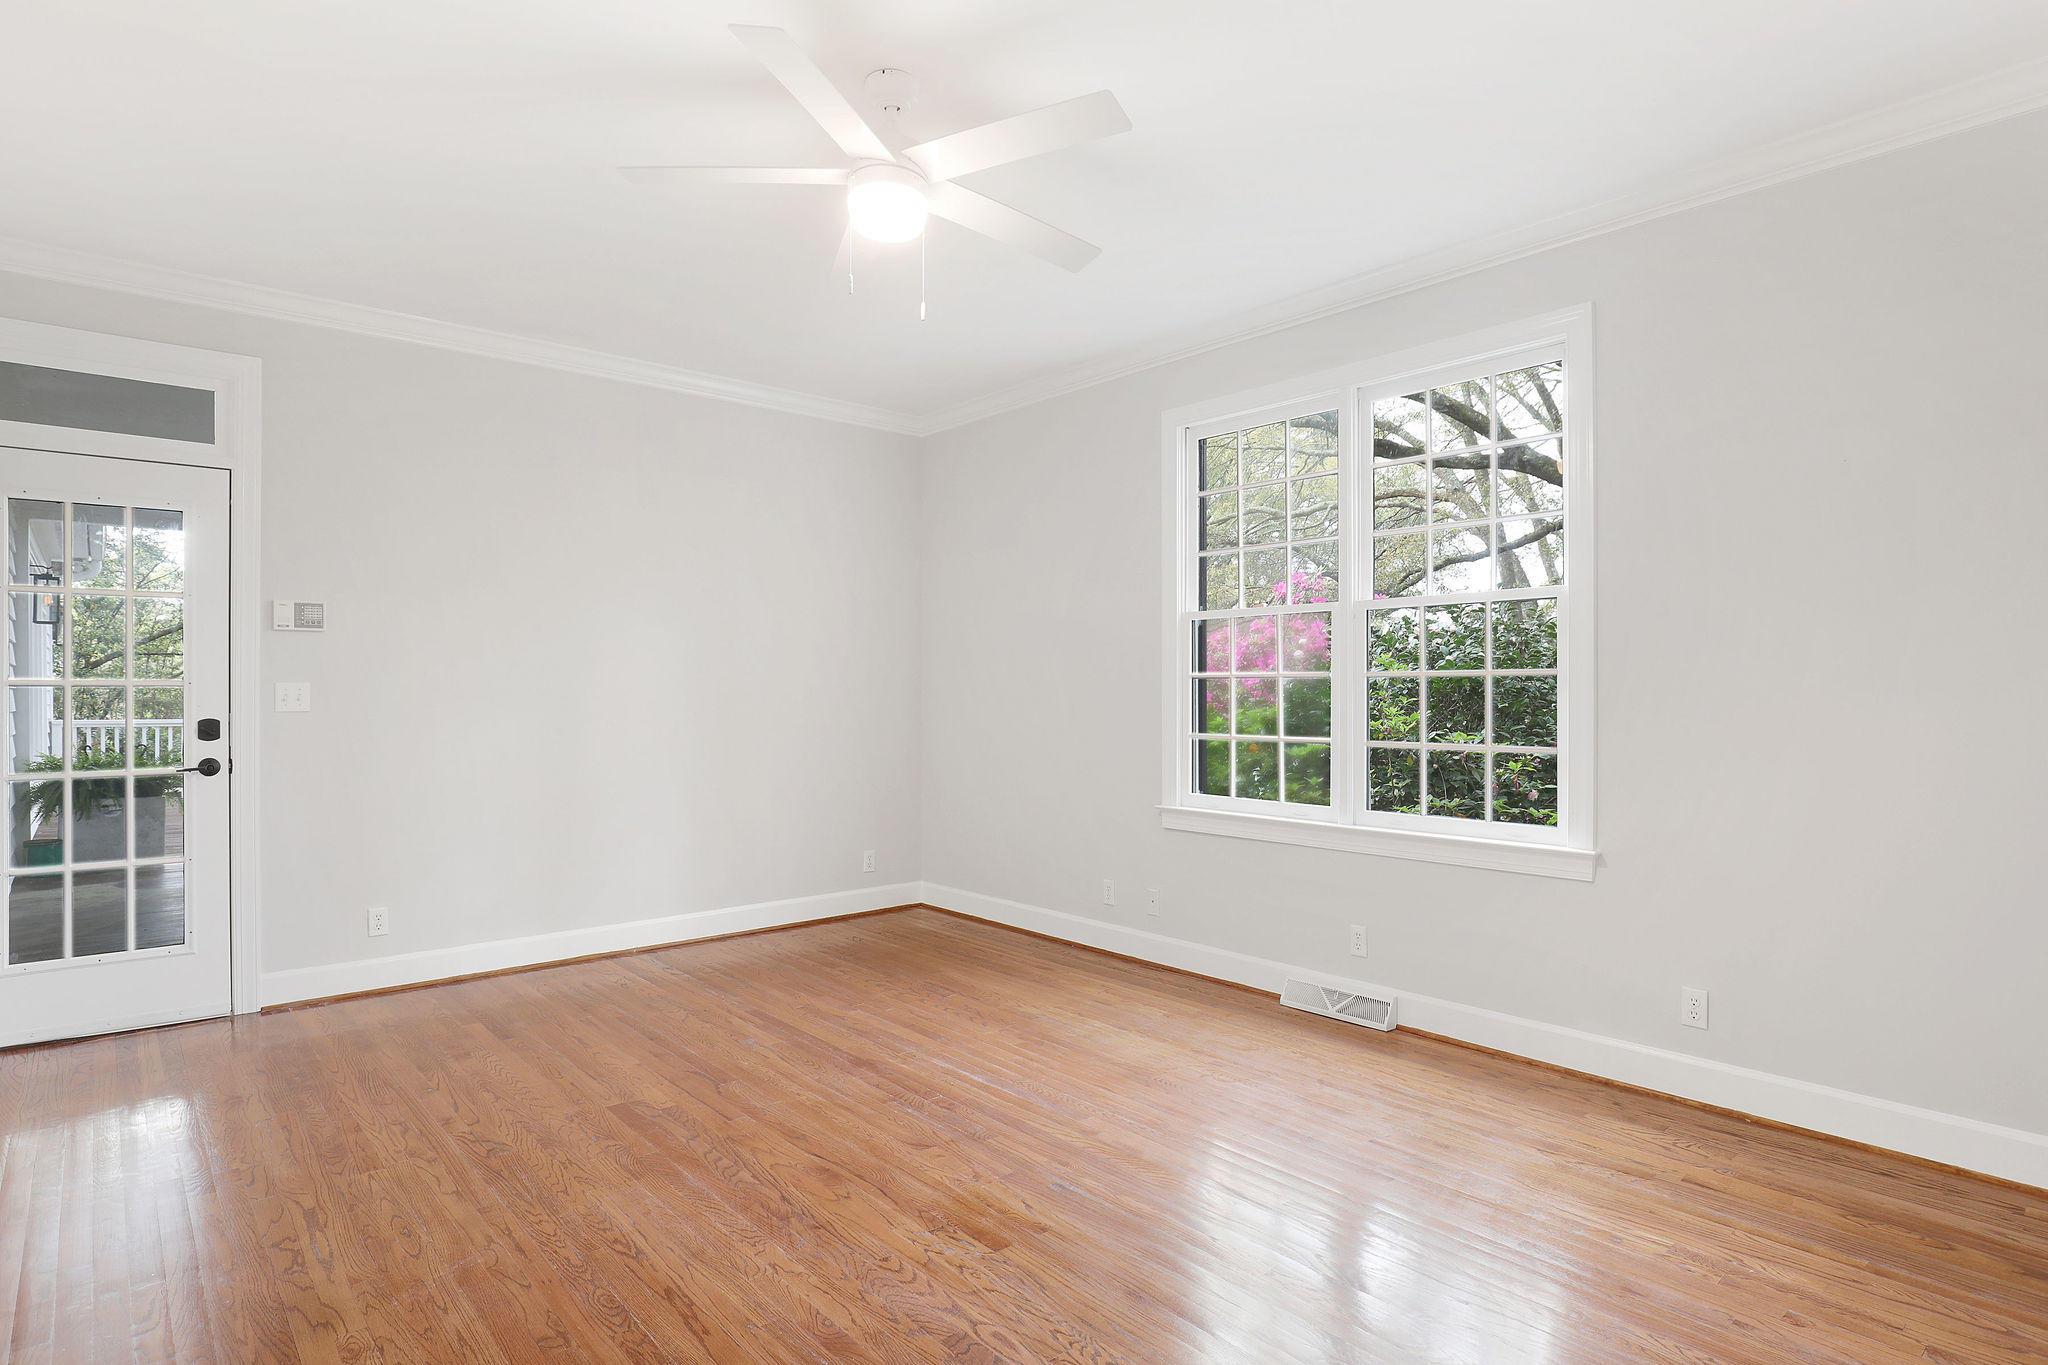 Old Mt Pleasant Homes For Sale - 1417 Edwards, Mount Pleasant, SC - 18